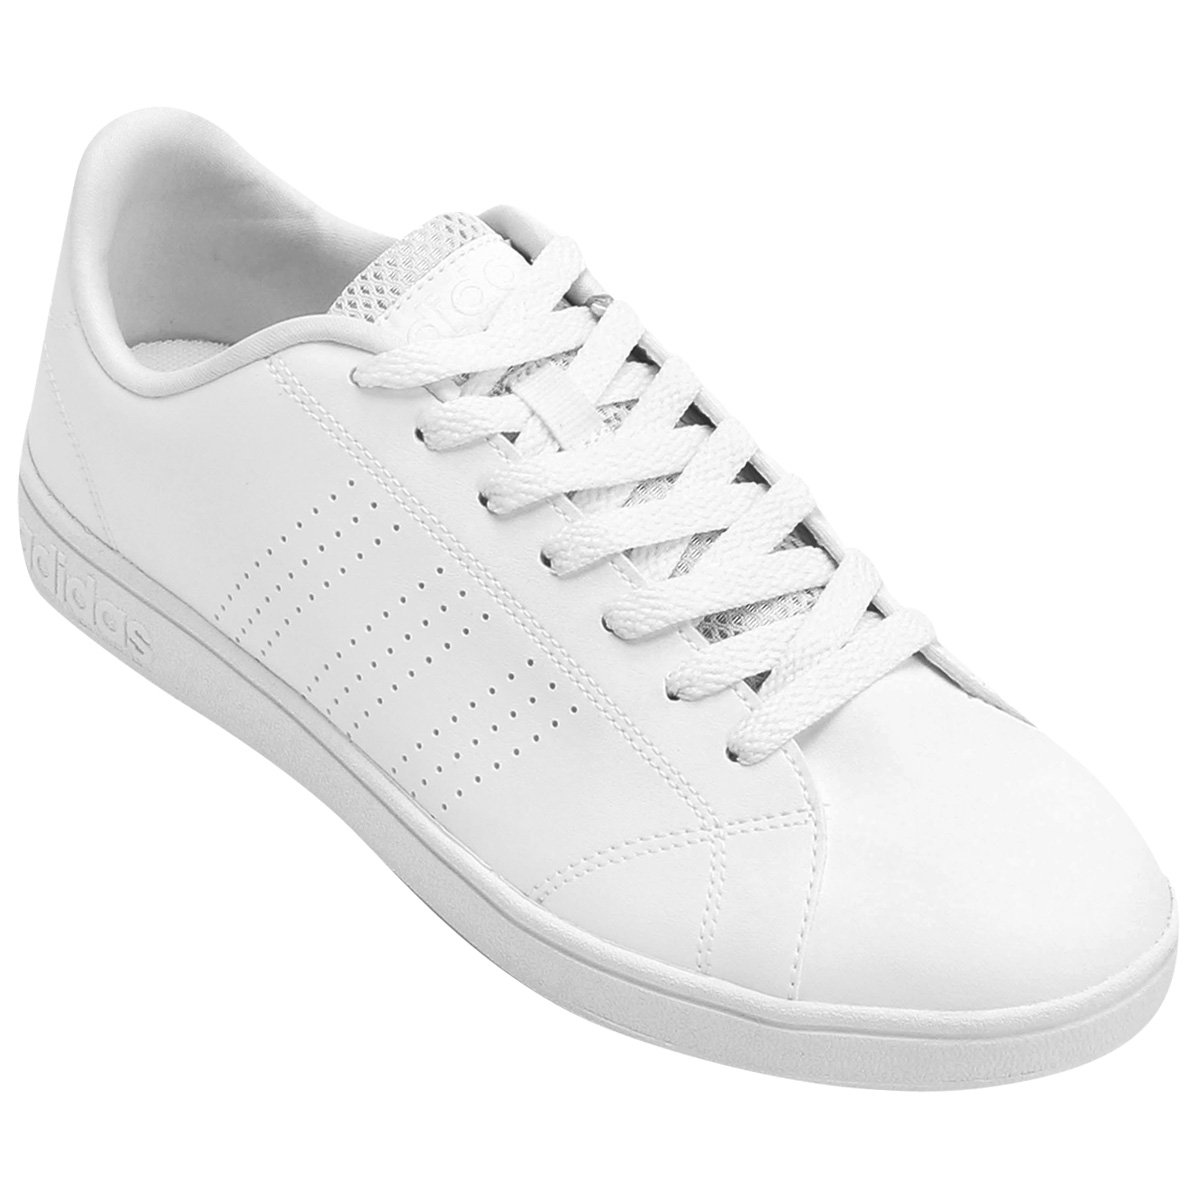 3b98973b92d Tênis Adidas Vs Advantage Clean Masculino - Branco - Compre Agora ...